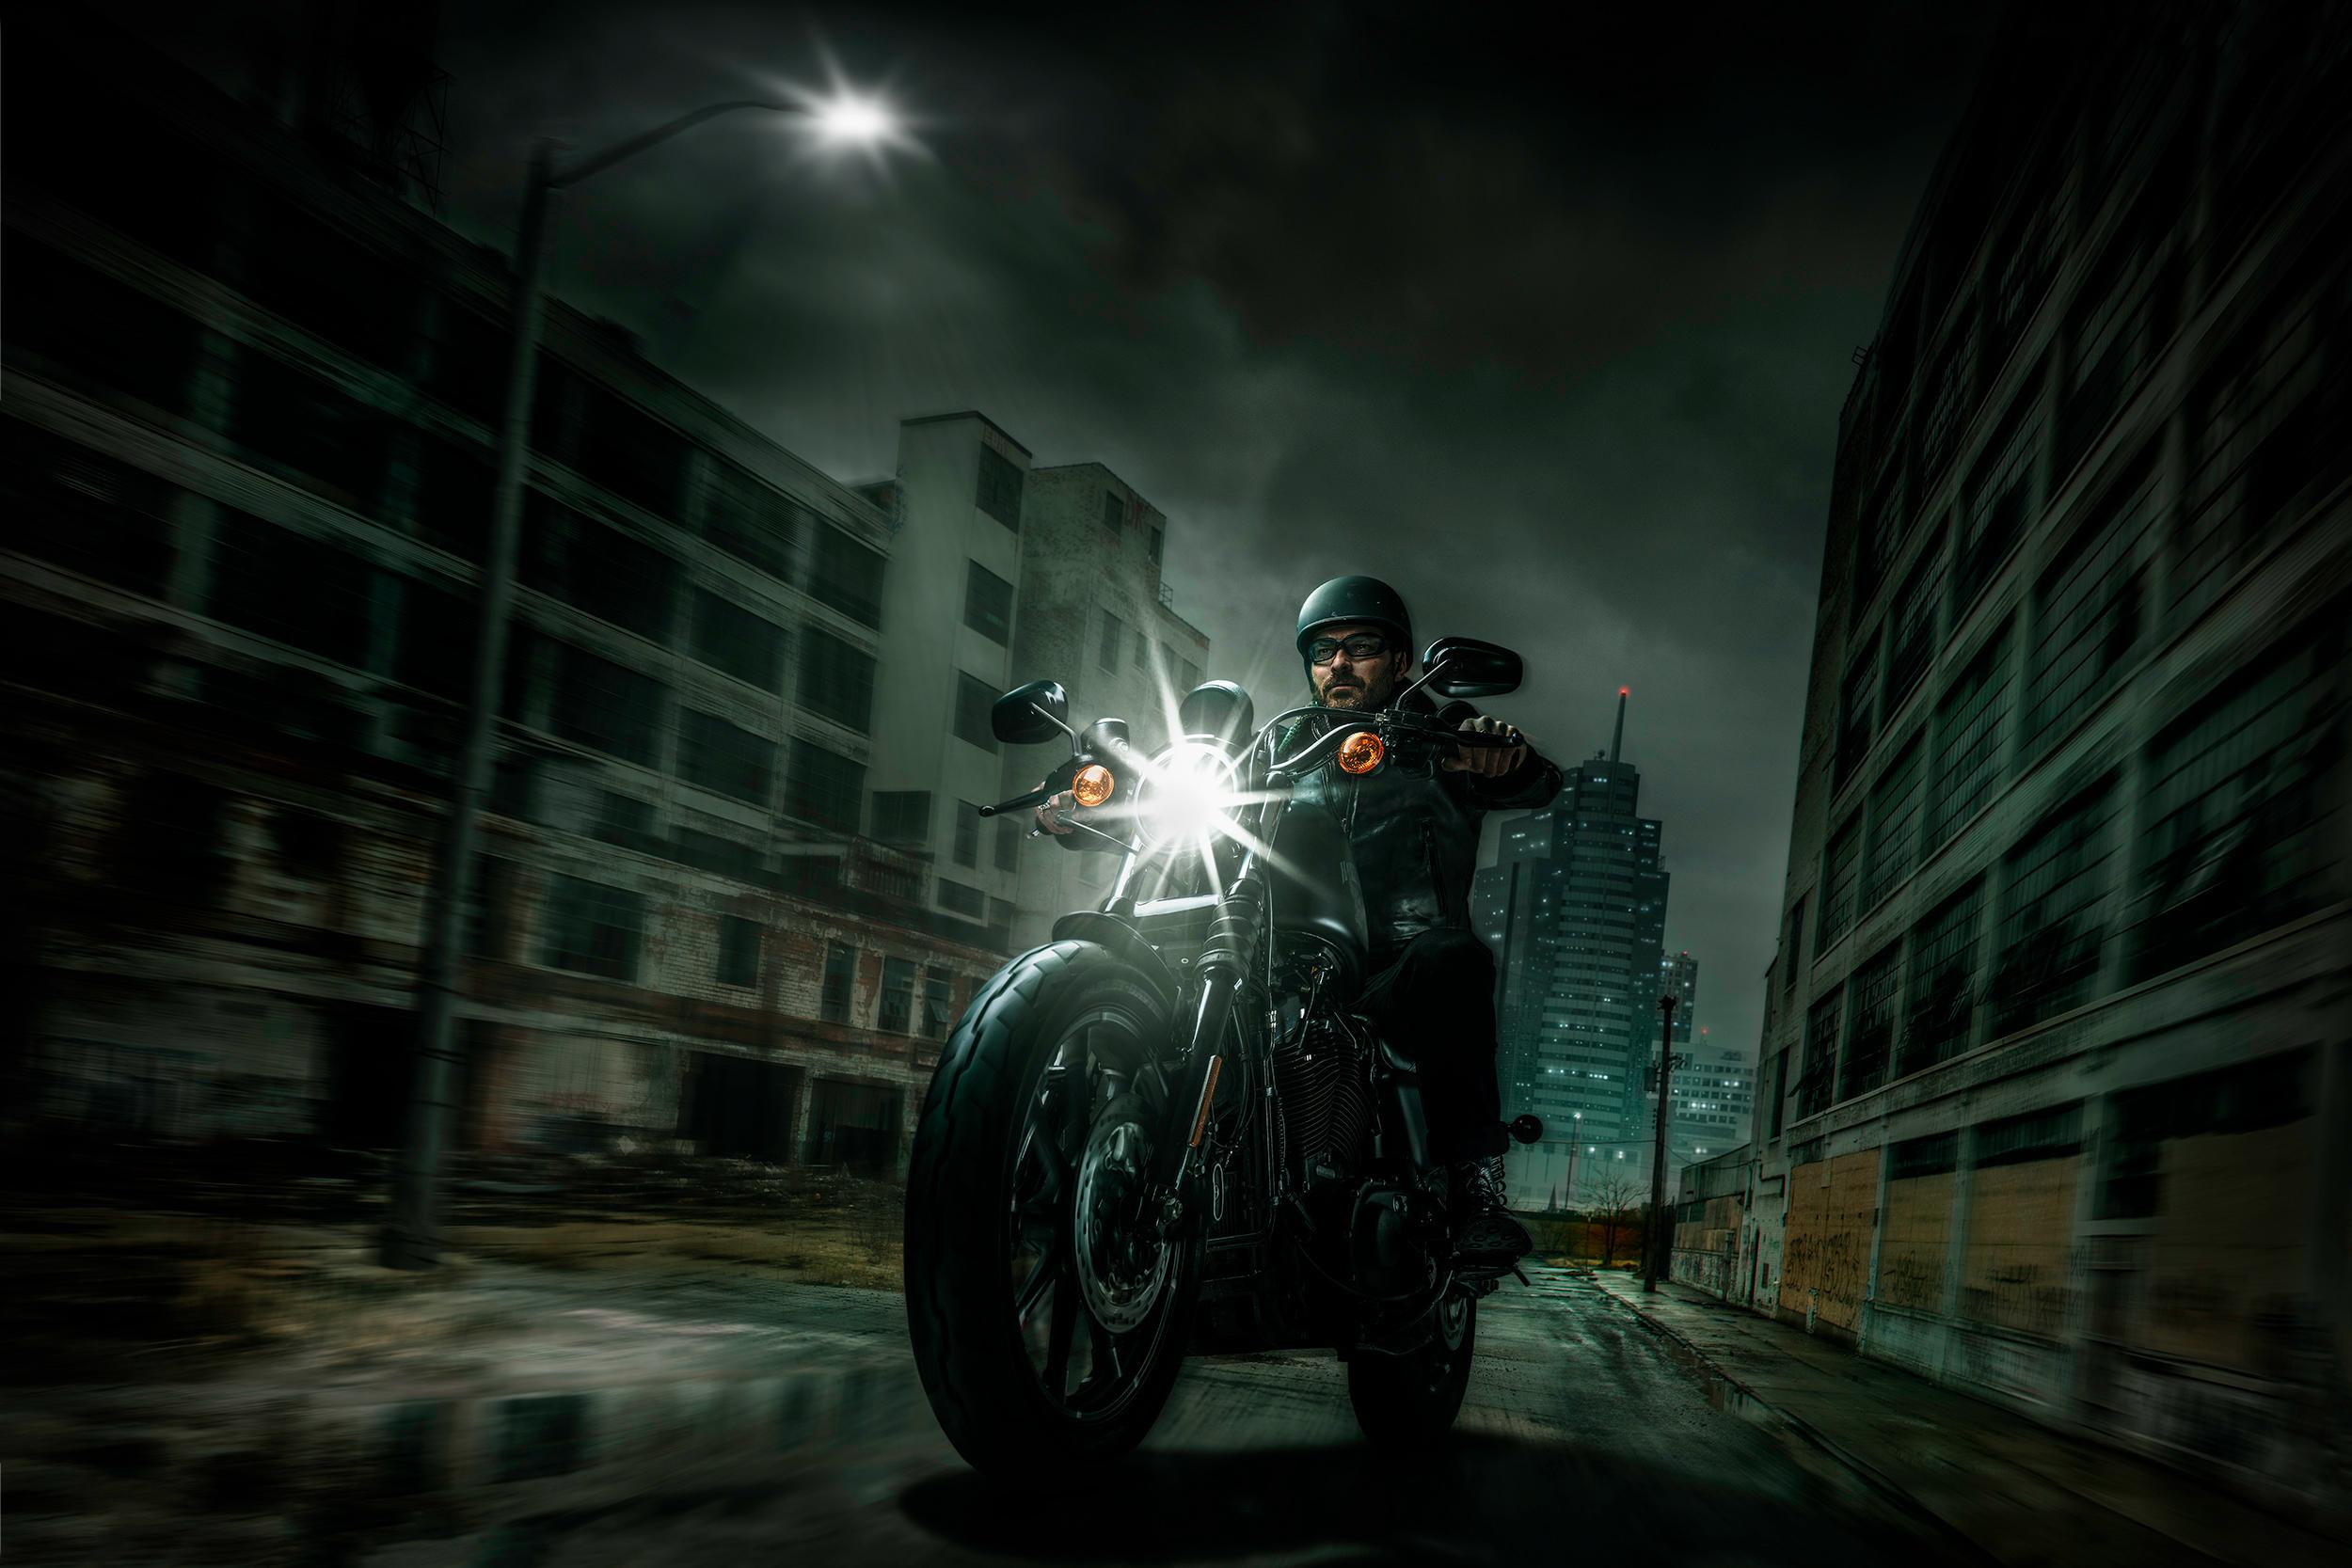 Harley Davidson Night Riders, HD Bikes, 4k Wallpapers